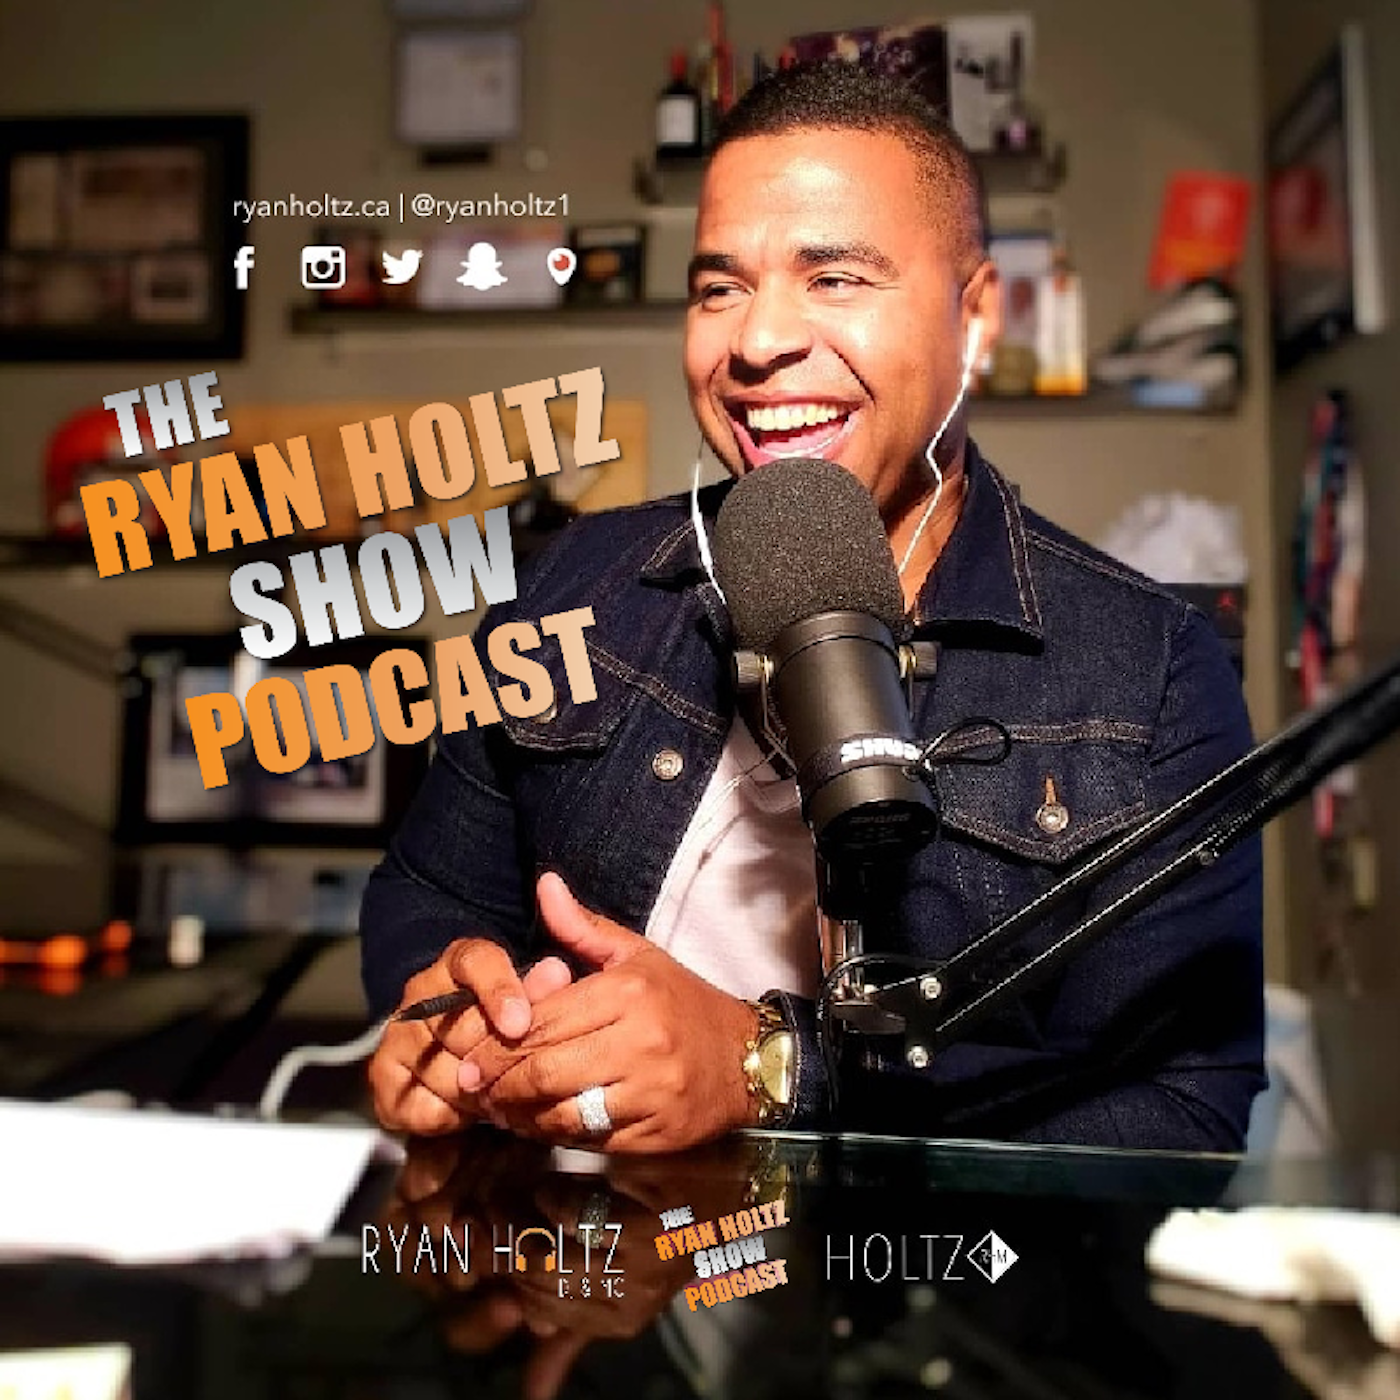 The Ryan Holtz Show